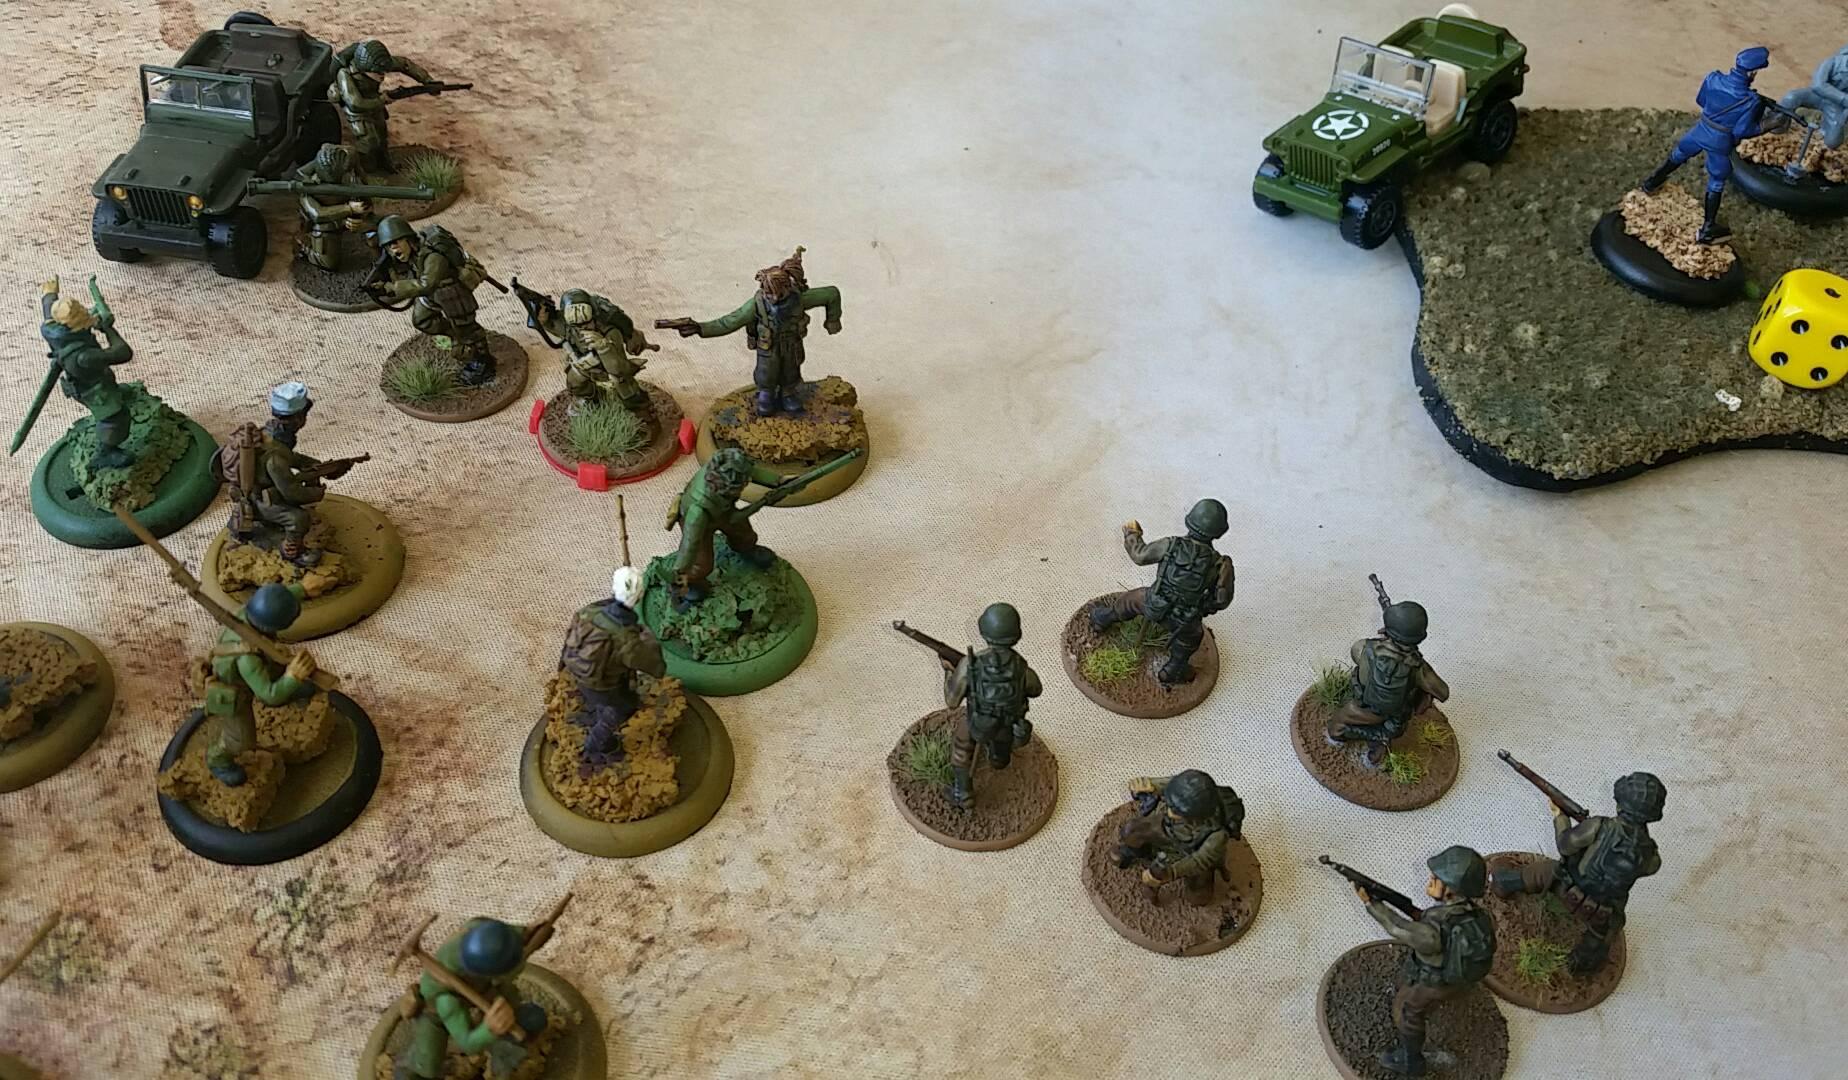 13th DbL Legion versus Germans in a fierce infantry engagement